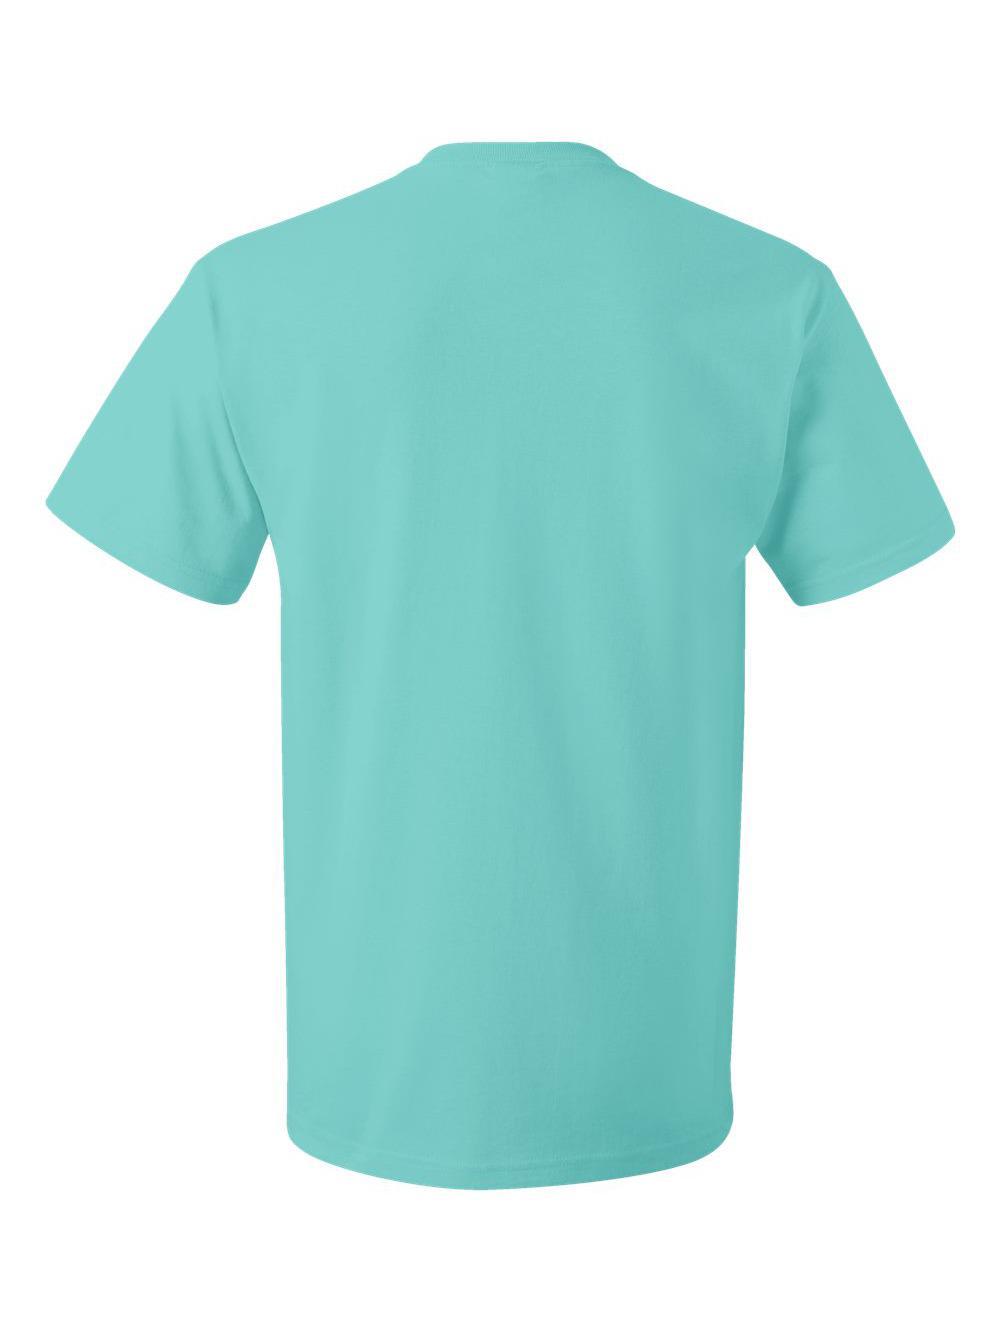 Fruit-of-the-Loom-HD-Cotton-Short-Sleeve-T-Shirt-3930R thumbnail 124